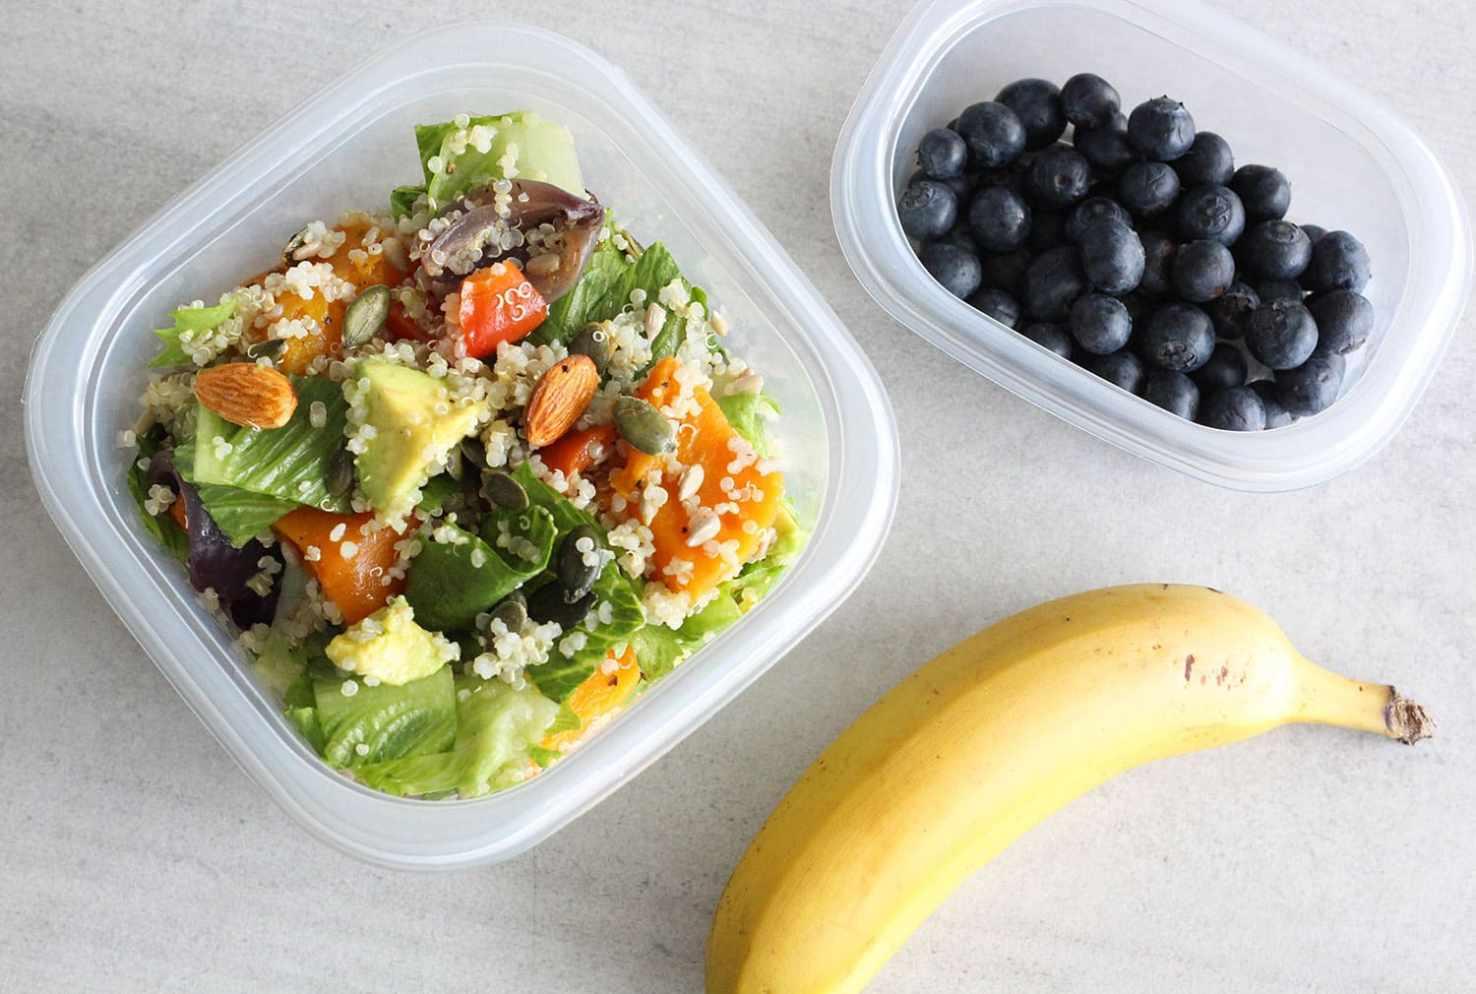 Easy Healthy Lunch Ideas For School Or Work